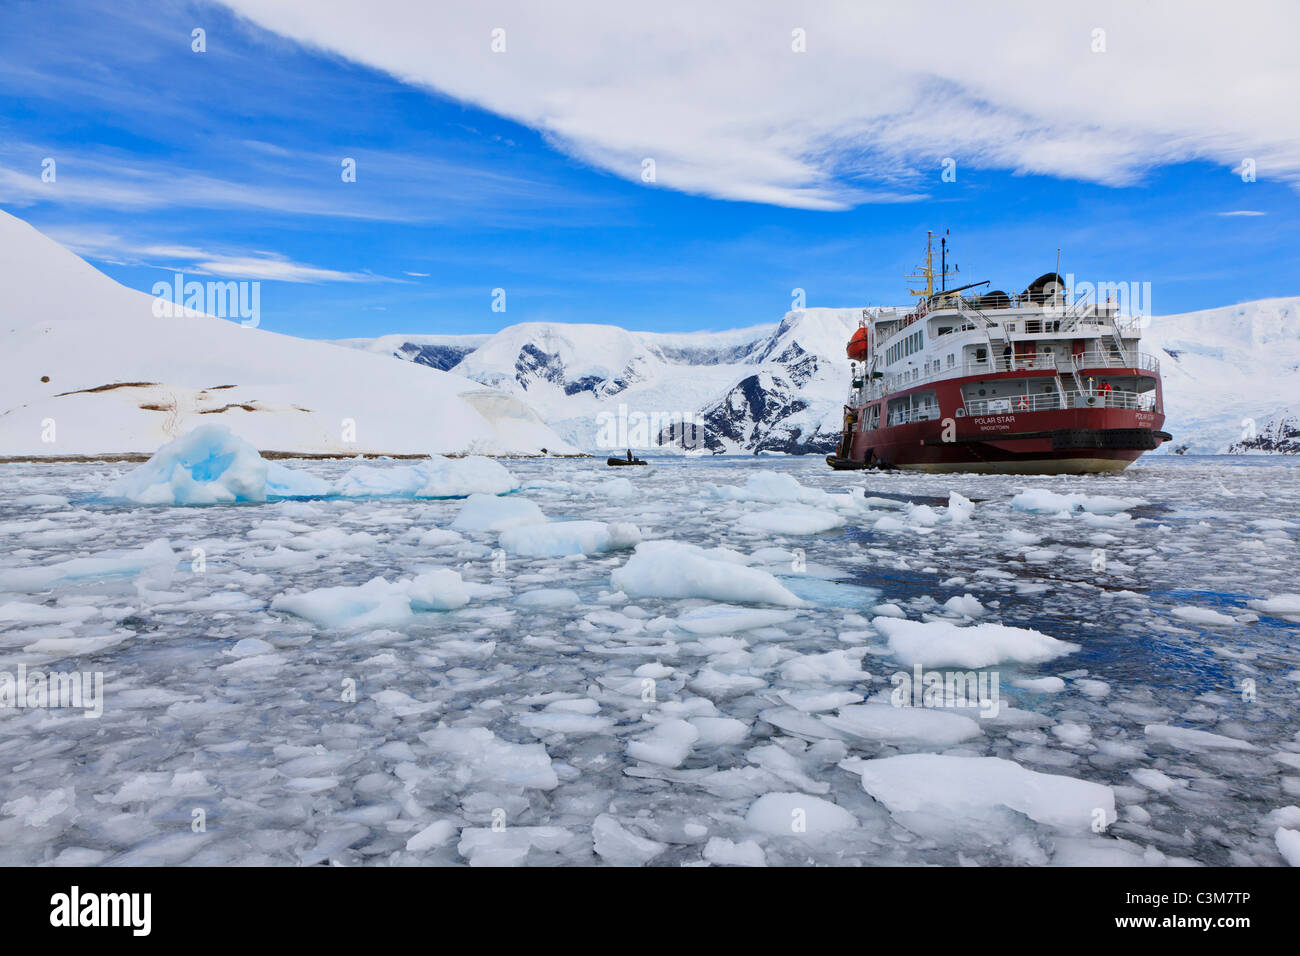 South Atlantic Ocean Antarctica Antarctic Peninsula Gerlache Strait, Neko Harbour. Polar star icebreaker cruise - Stock Image